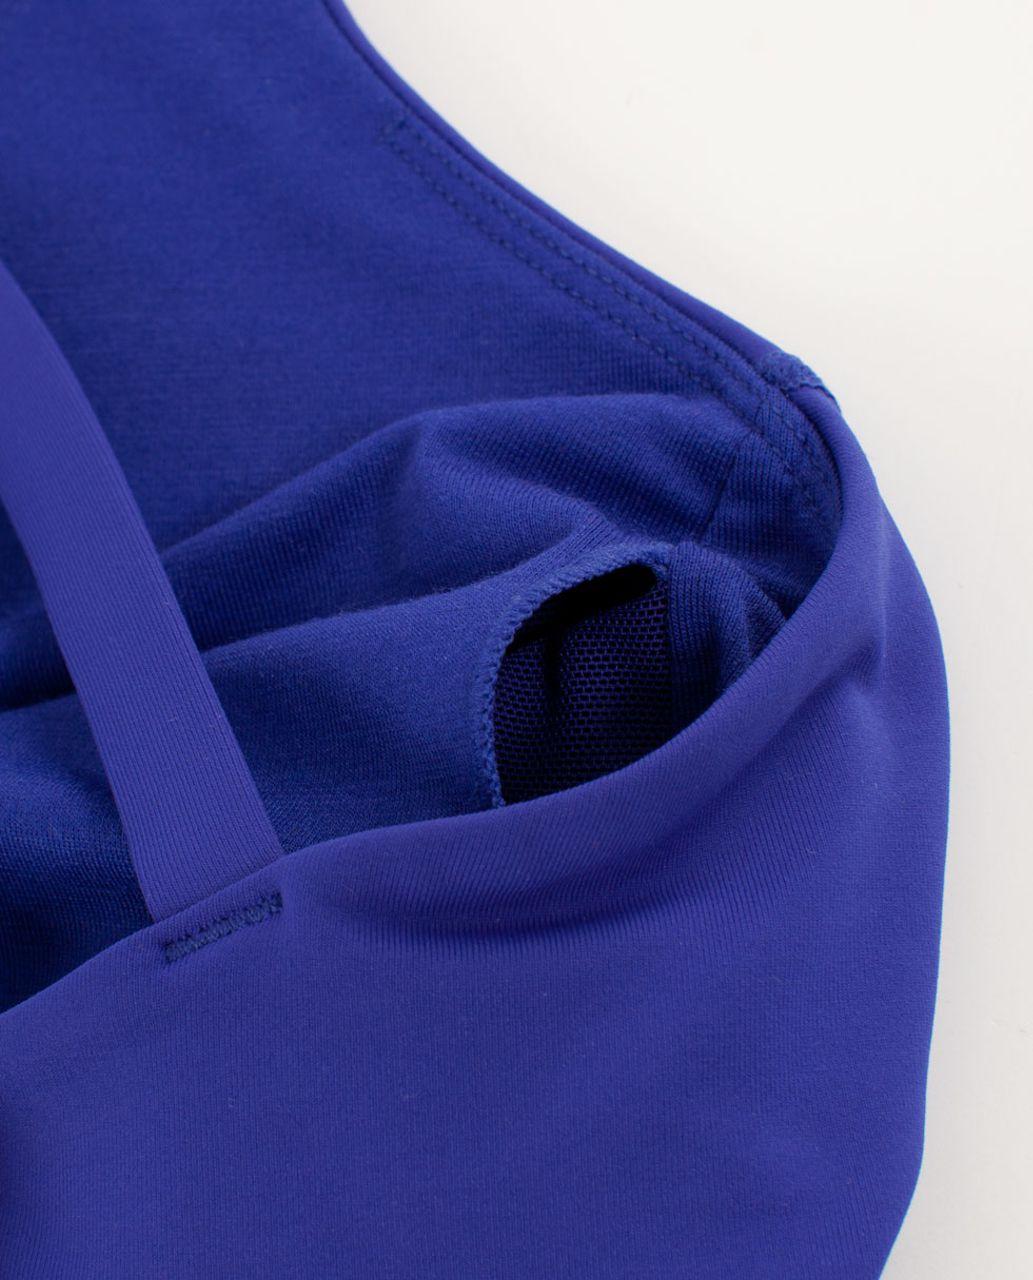 Lululemon Energy Bra - Pigment Blue